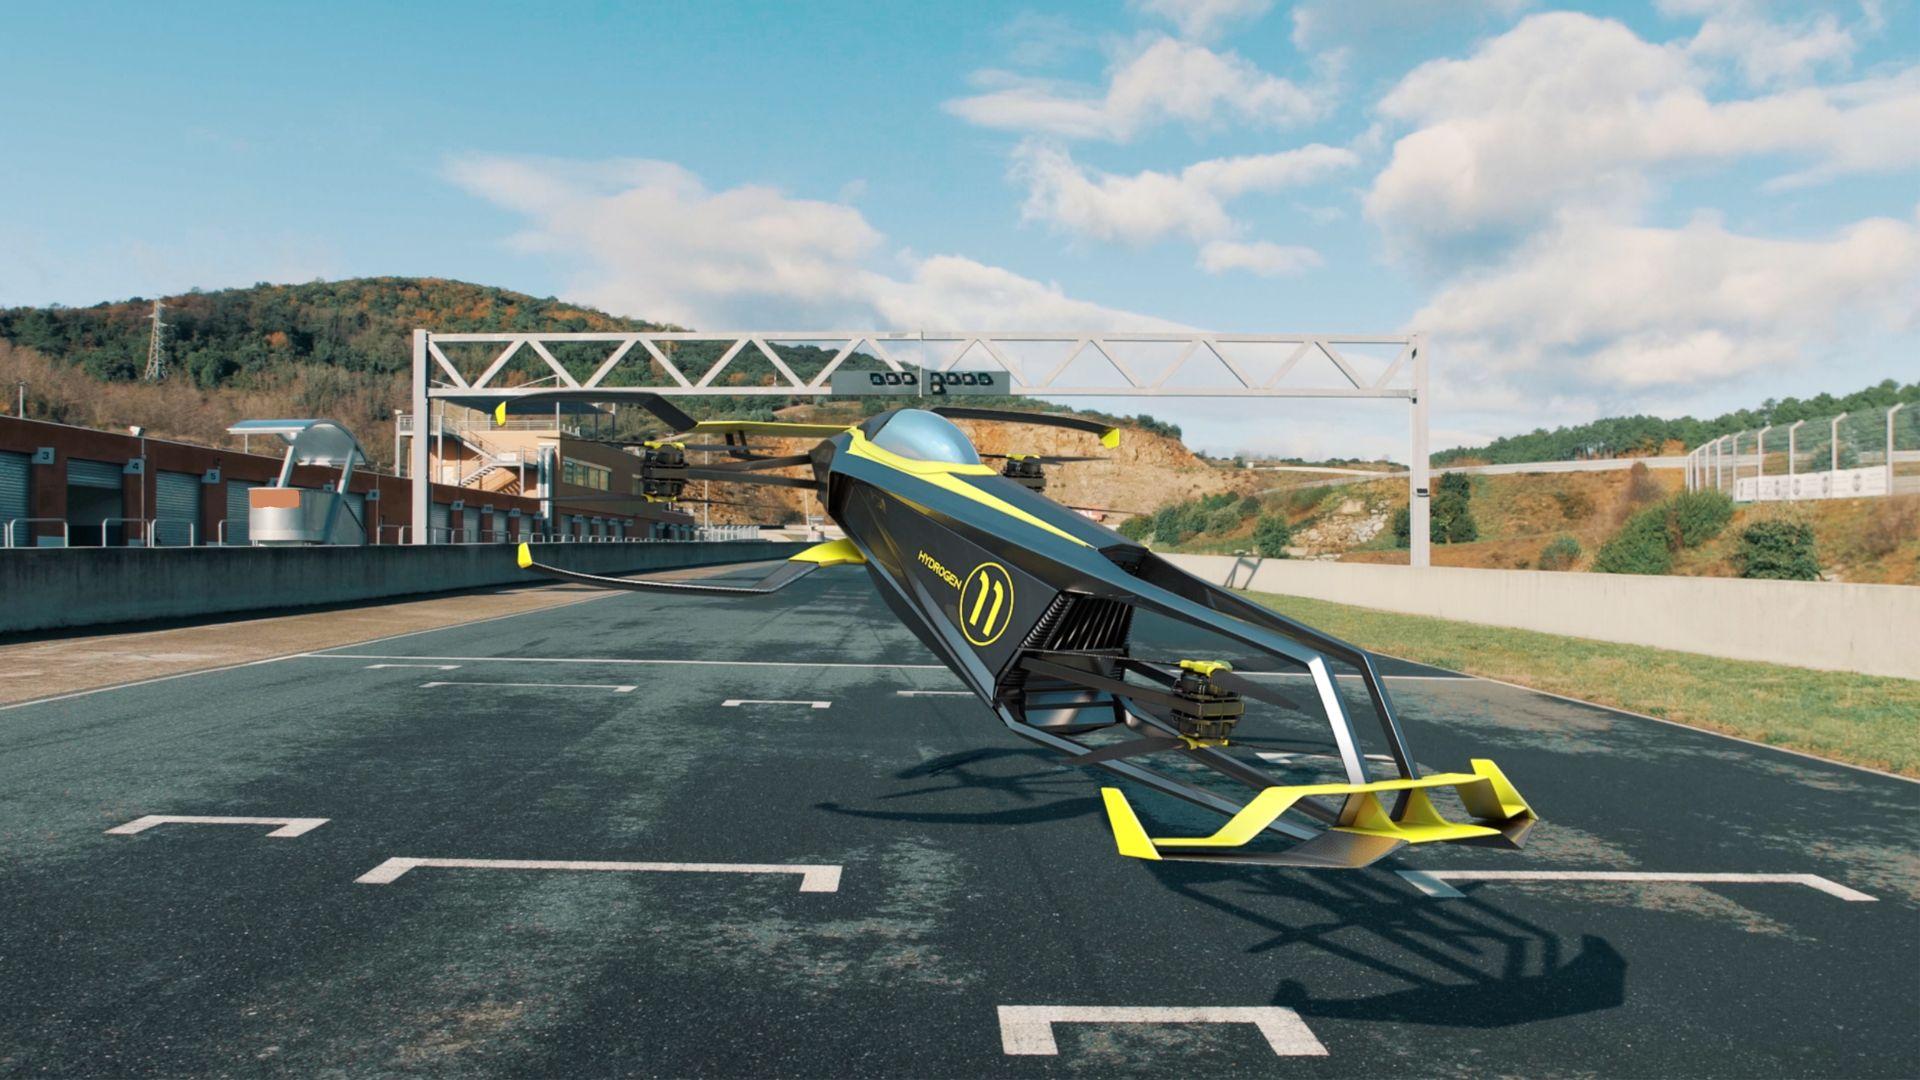 réalisation CarCopter, first hydrogen flying formula 1 - MACA